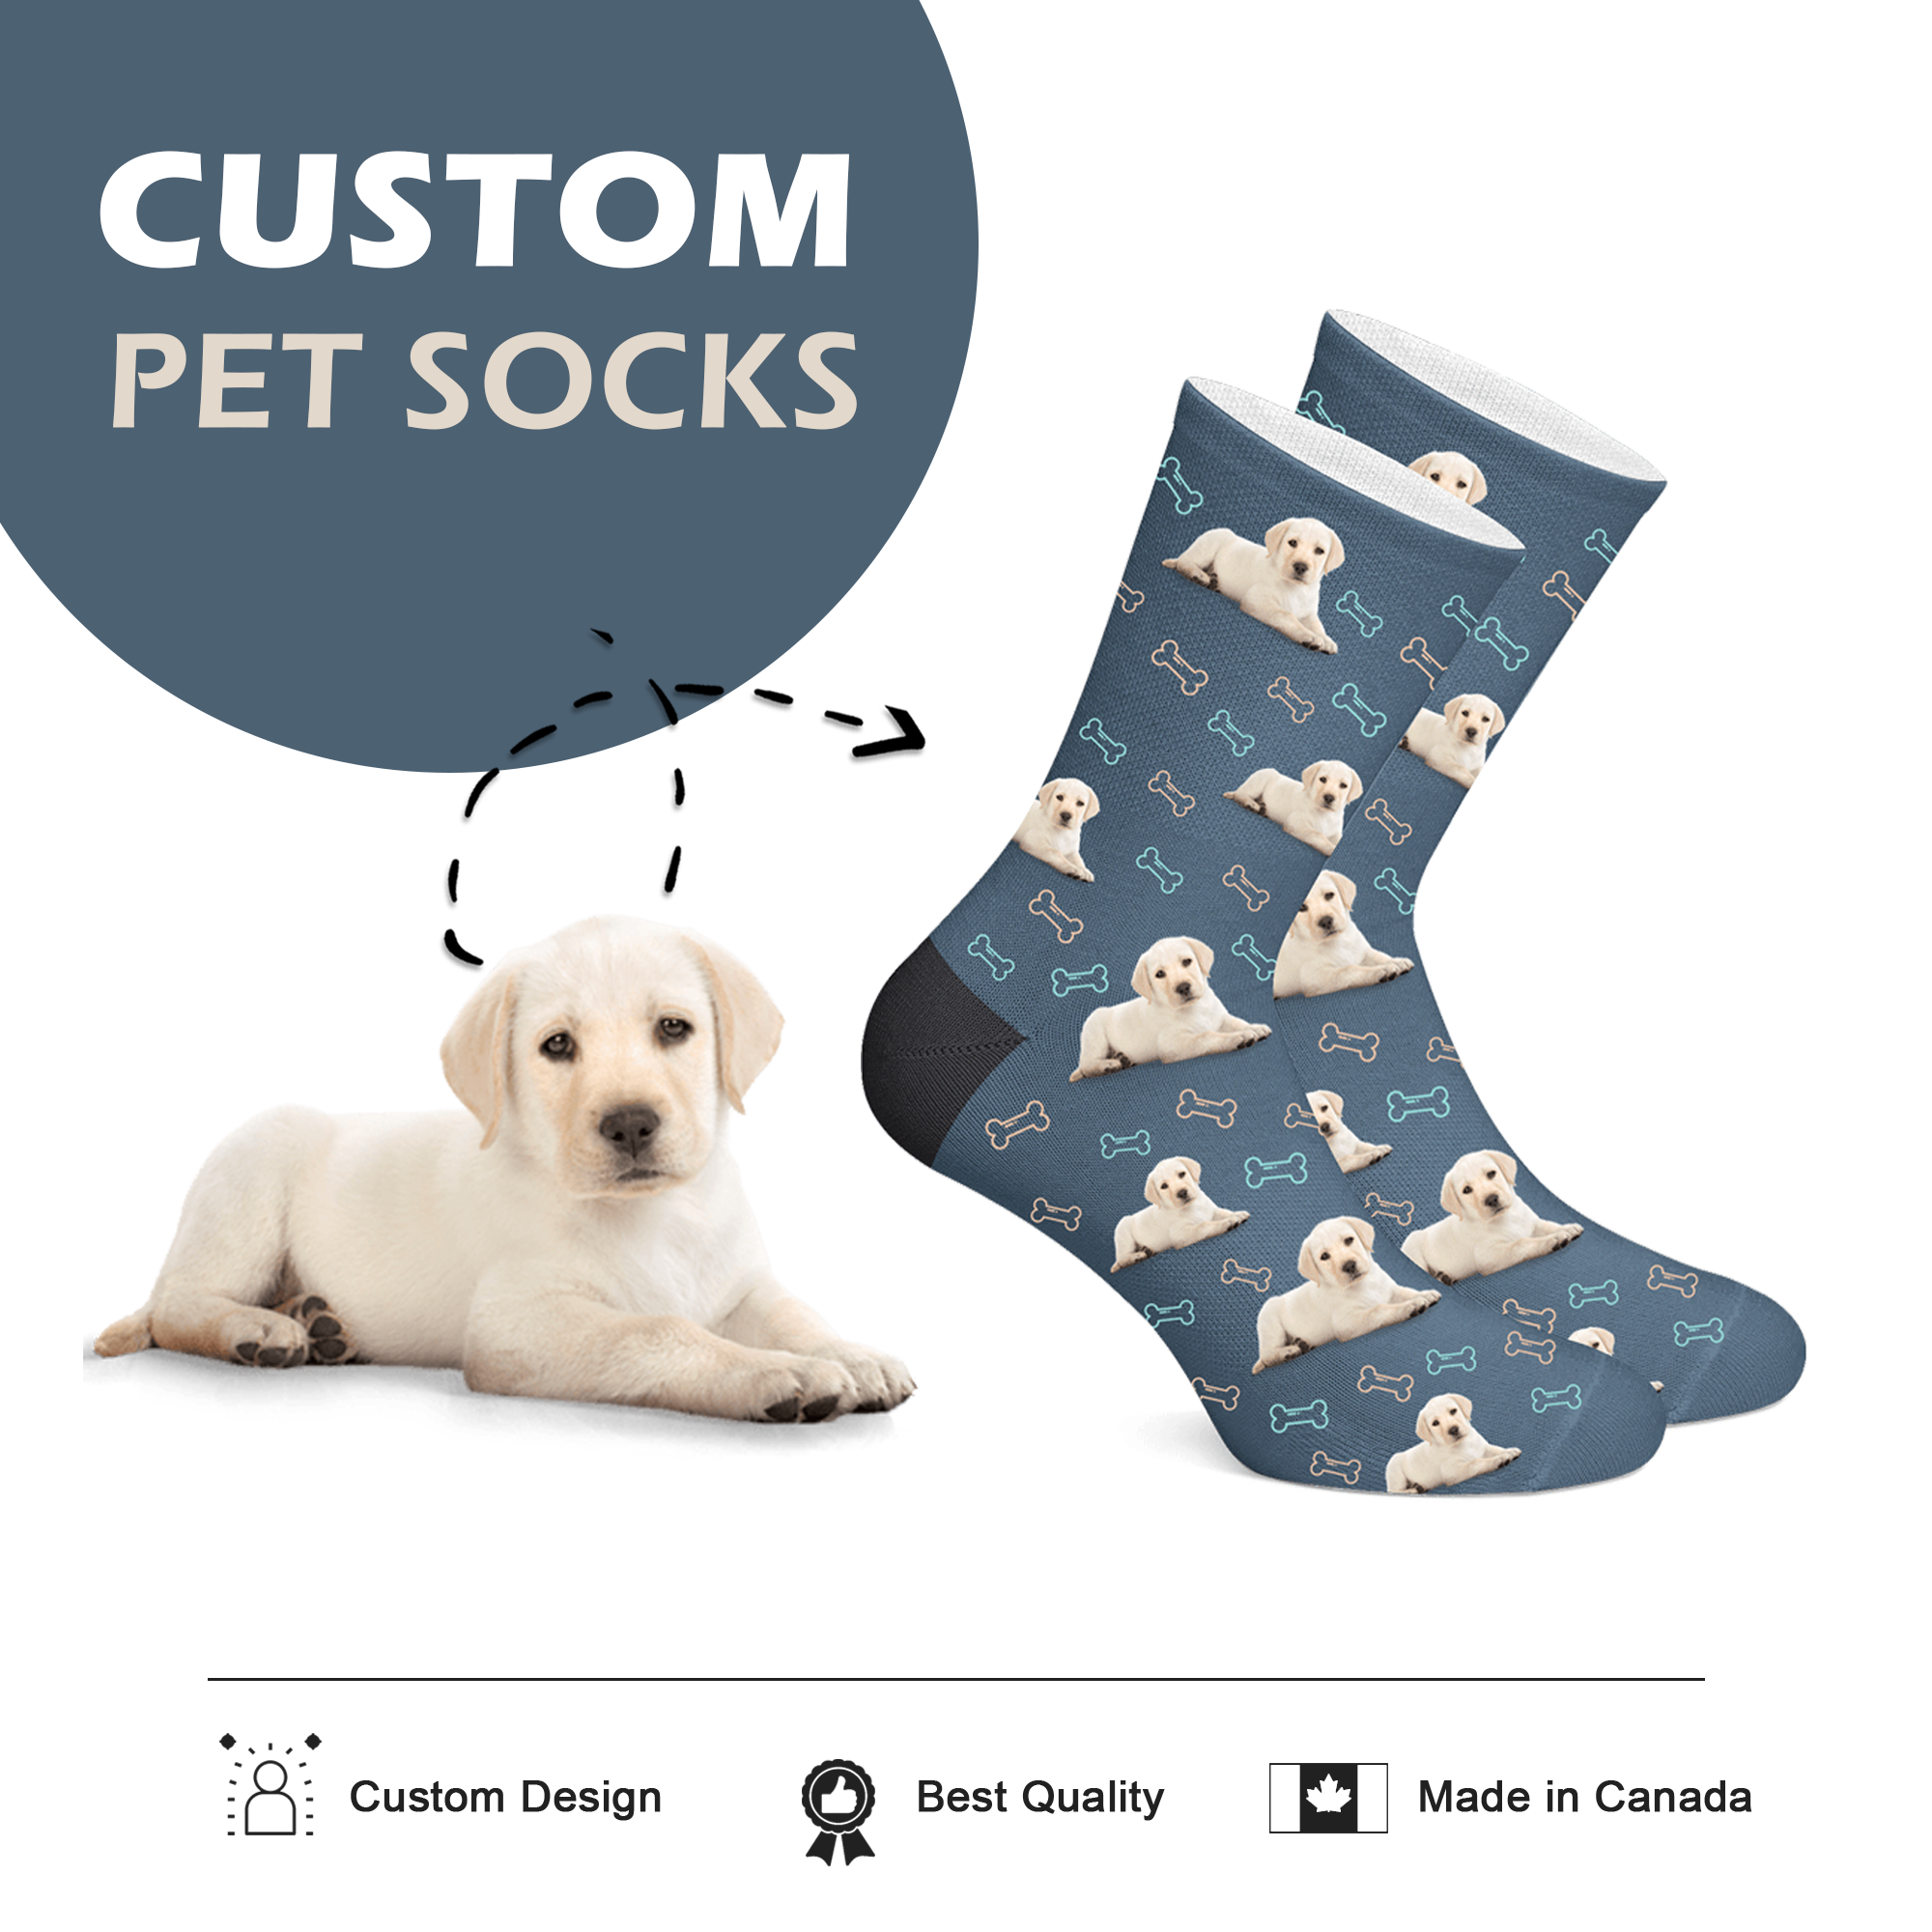 Custom Socks with Dog Print - Full Body